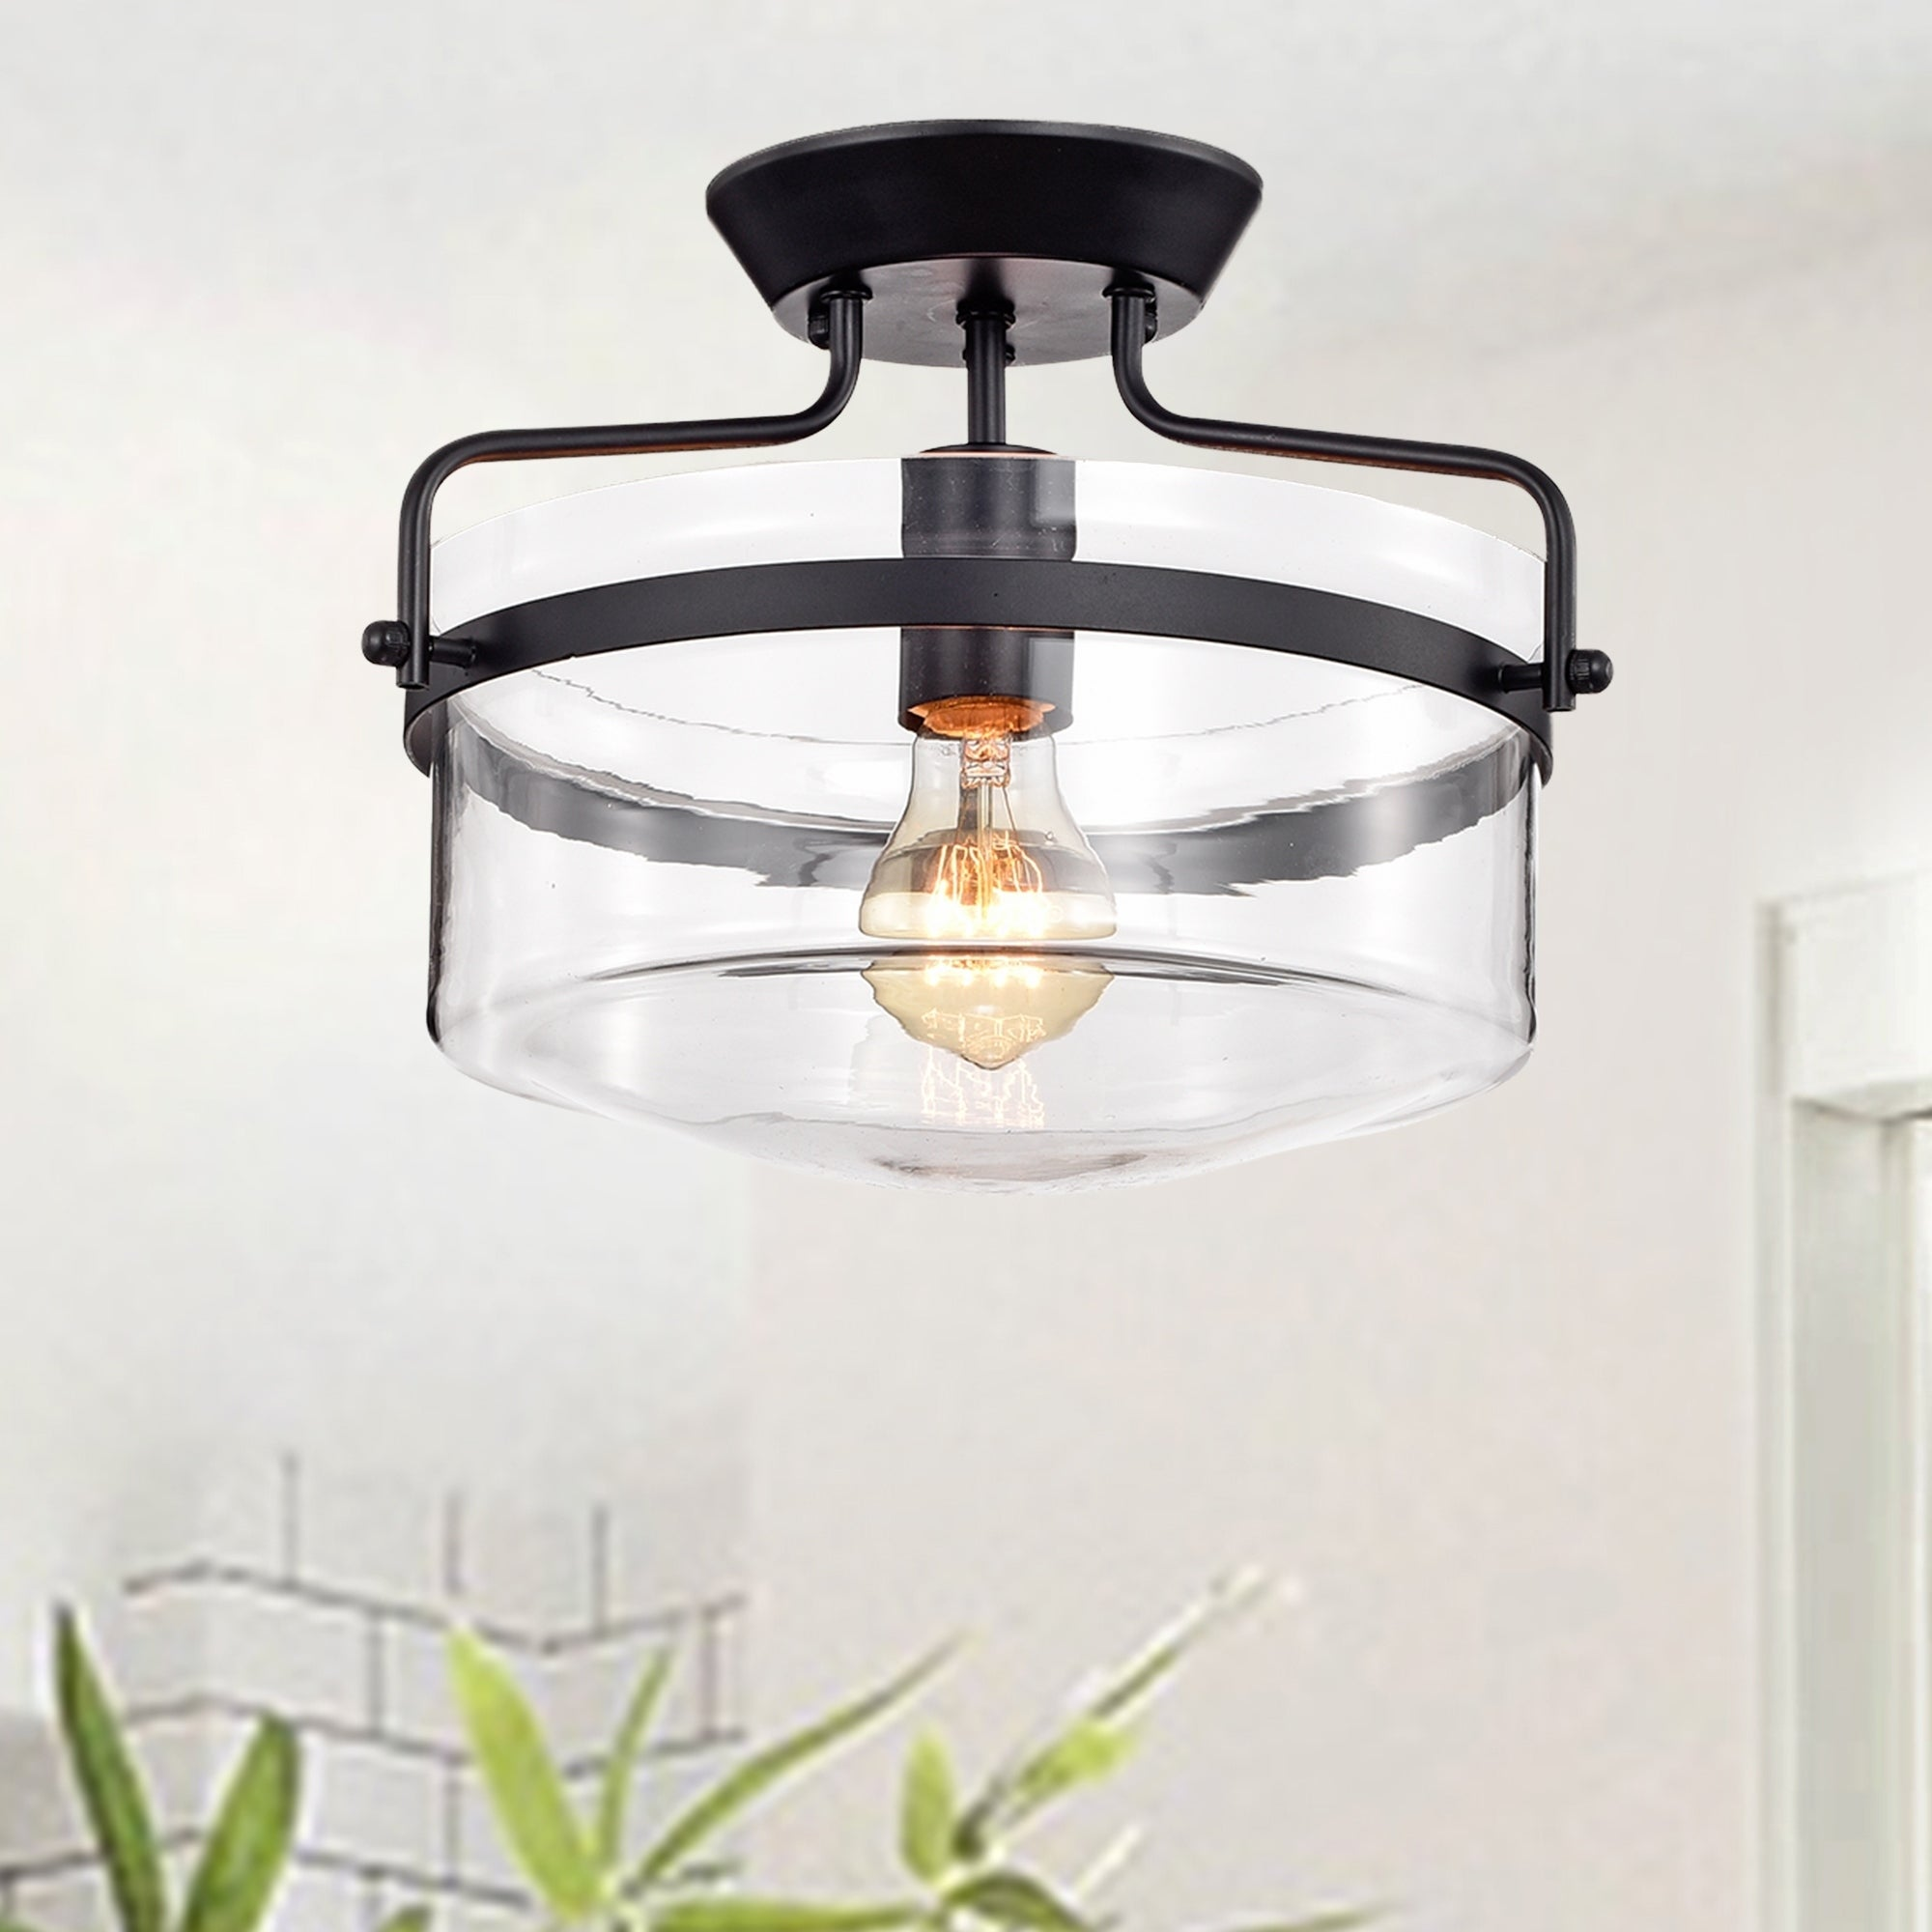 Buy Flush Mount Lighting Online at Overstock.com | Our Best Lighting on